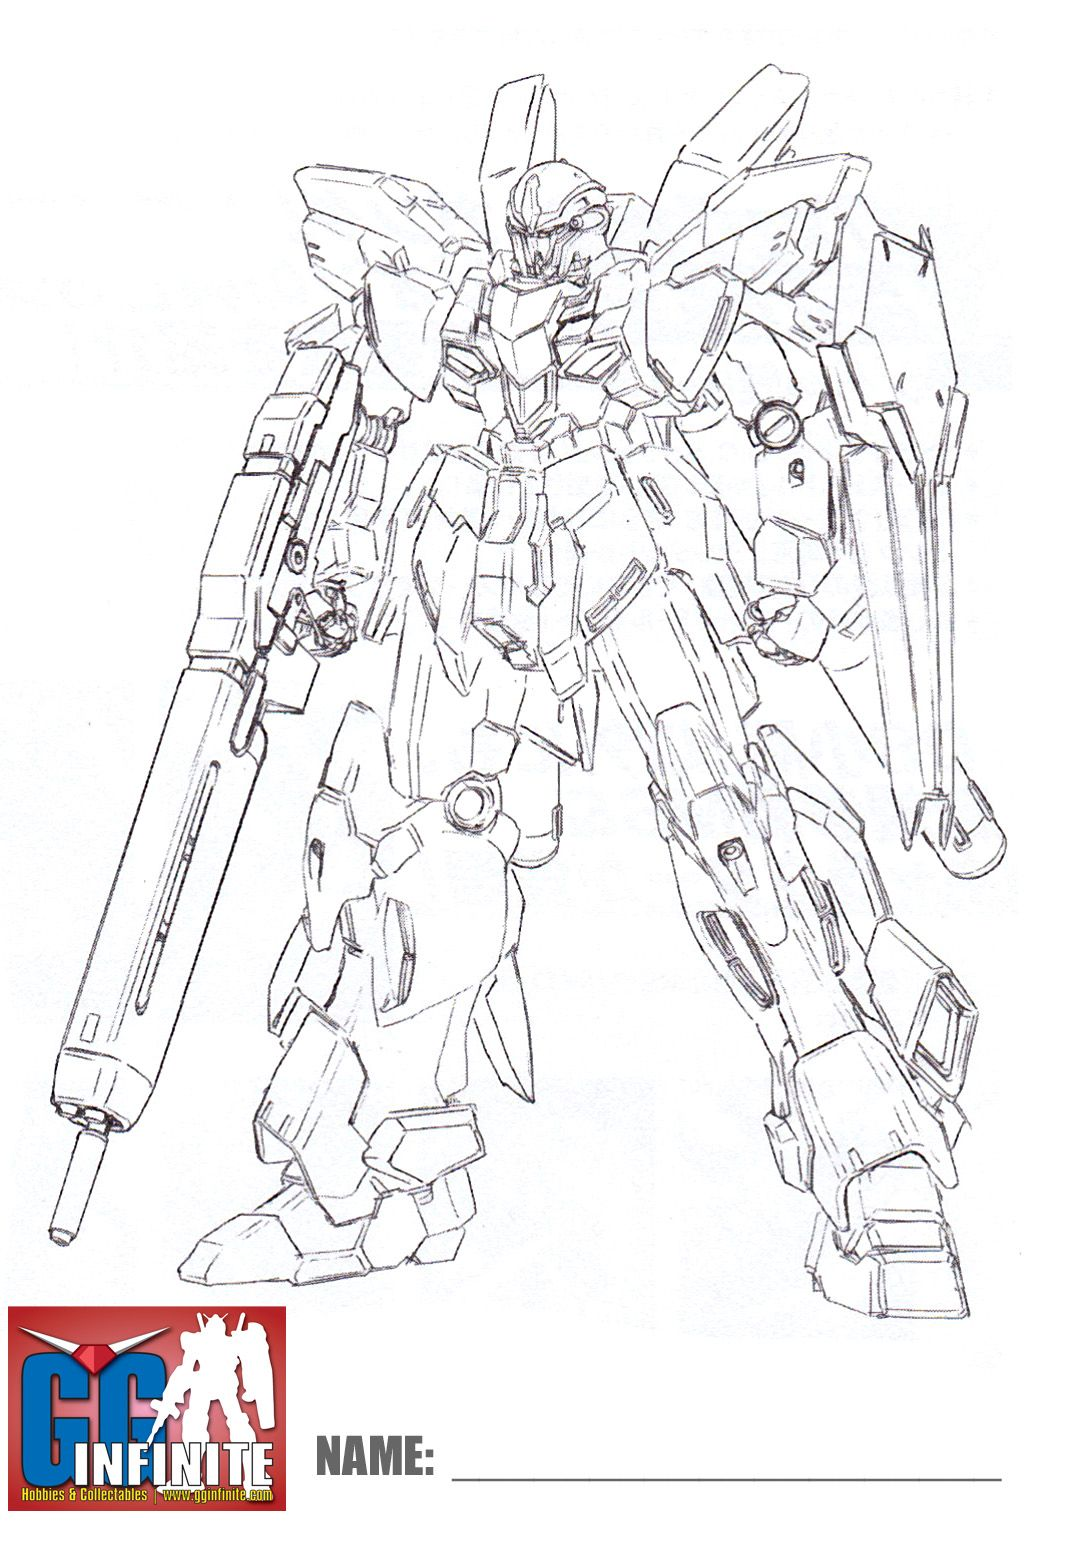 Gundam And Mobile Suit Pencil Drawings By Vicki Via Pixiv Gundam